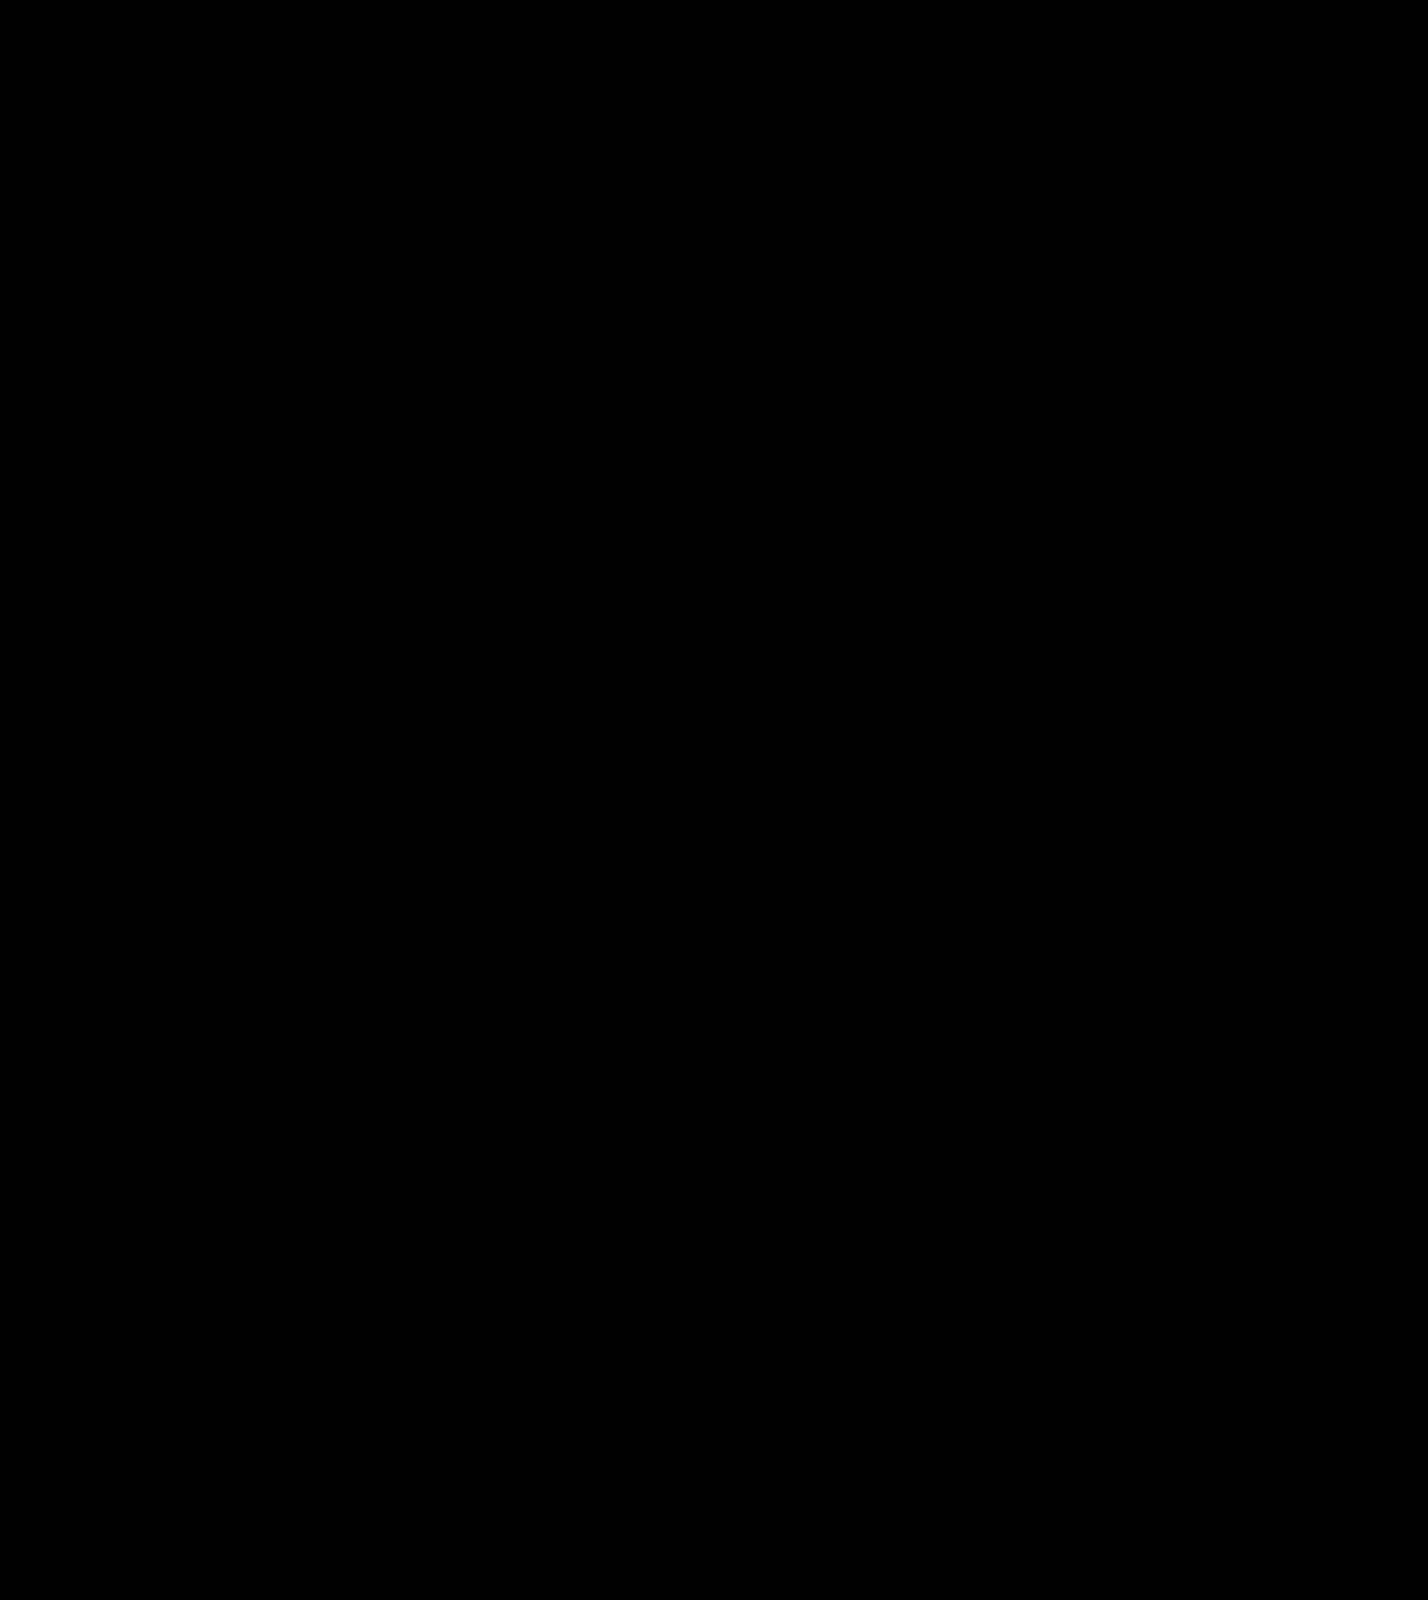 logodol ロゴドル: 番外編:三 ... : 三年の漢字 : 漢字